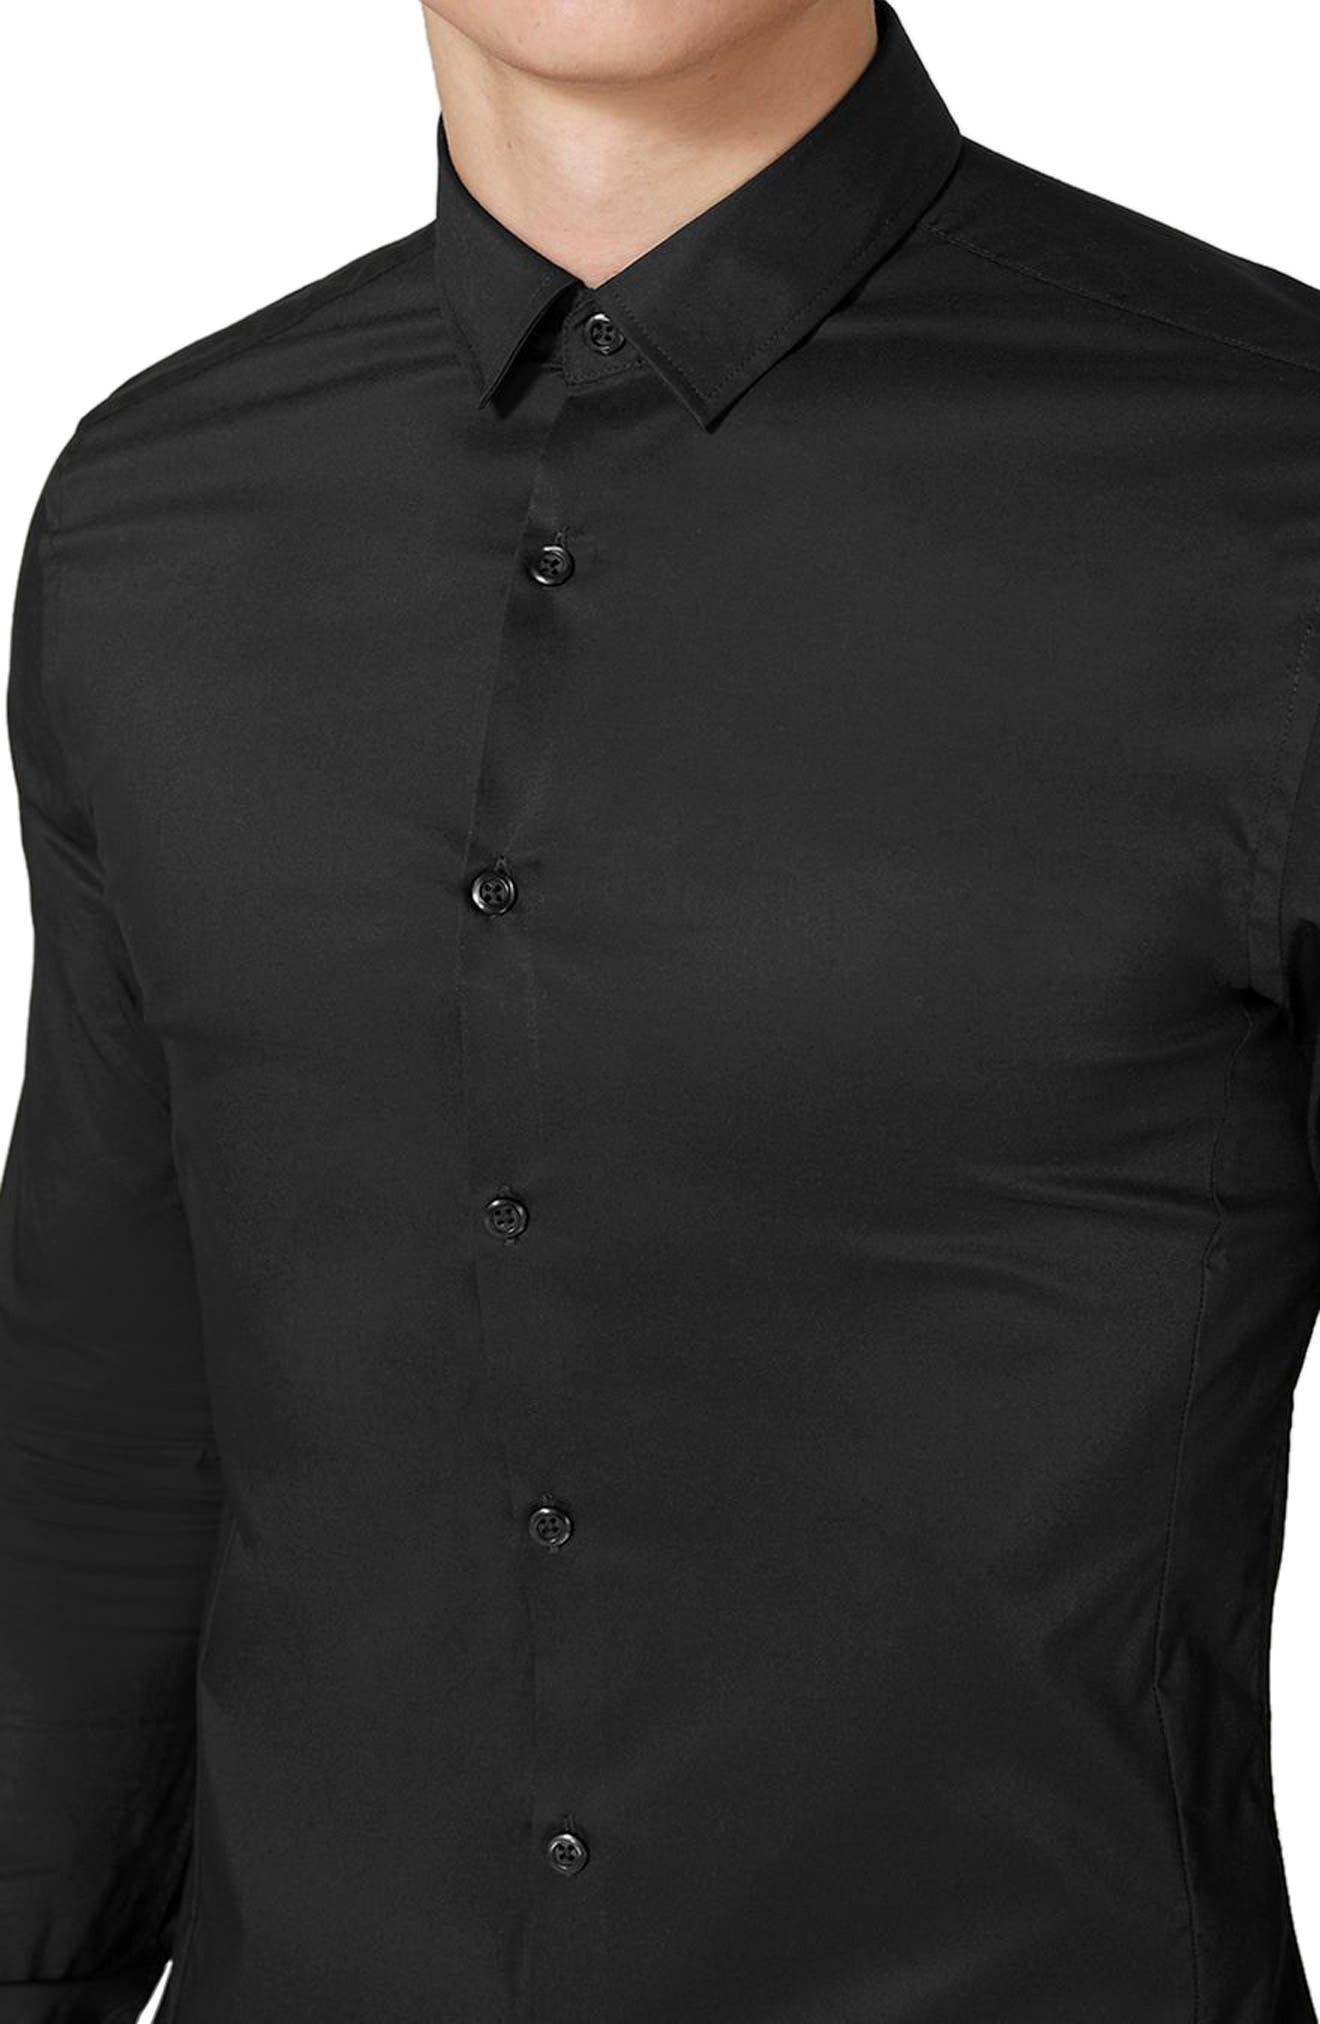 TOPMAN, Muscle Fit Stretch Poplin Shirt, Alternate thumbnail 3, color, BLACK